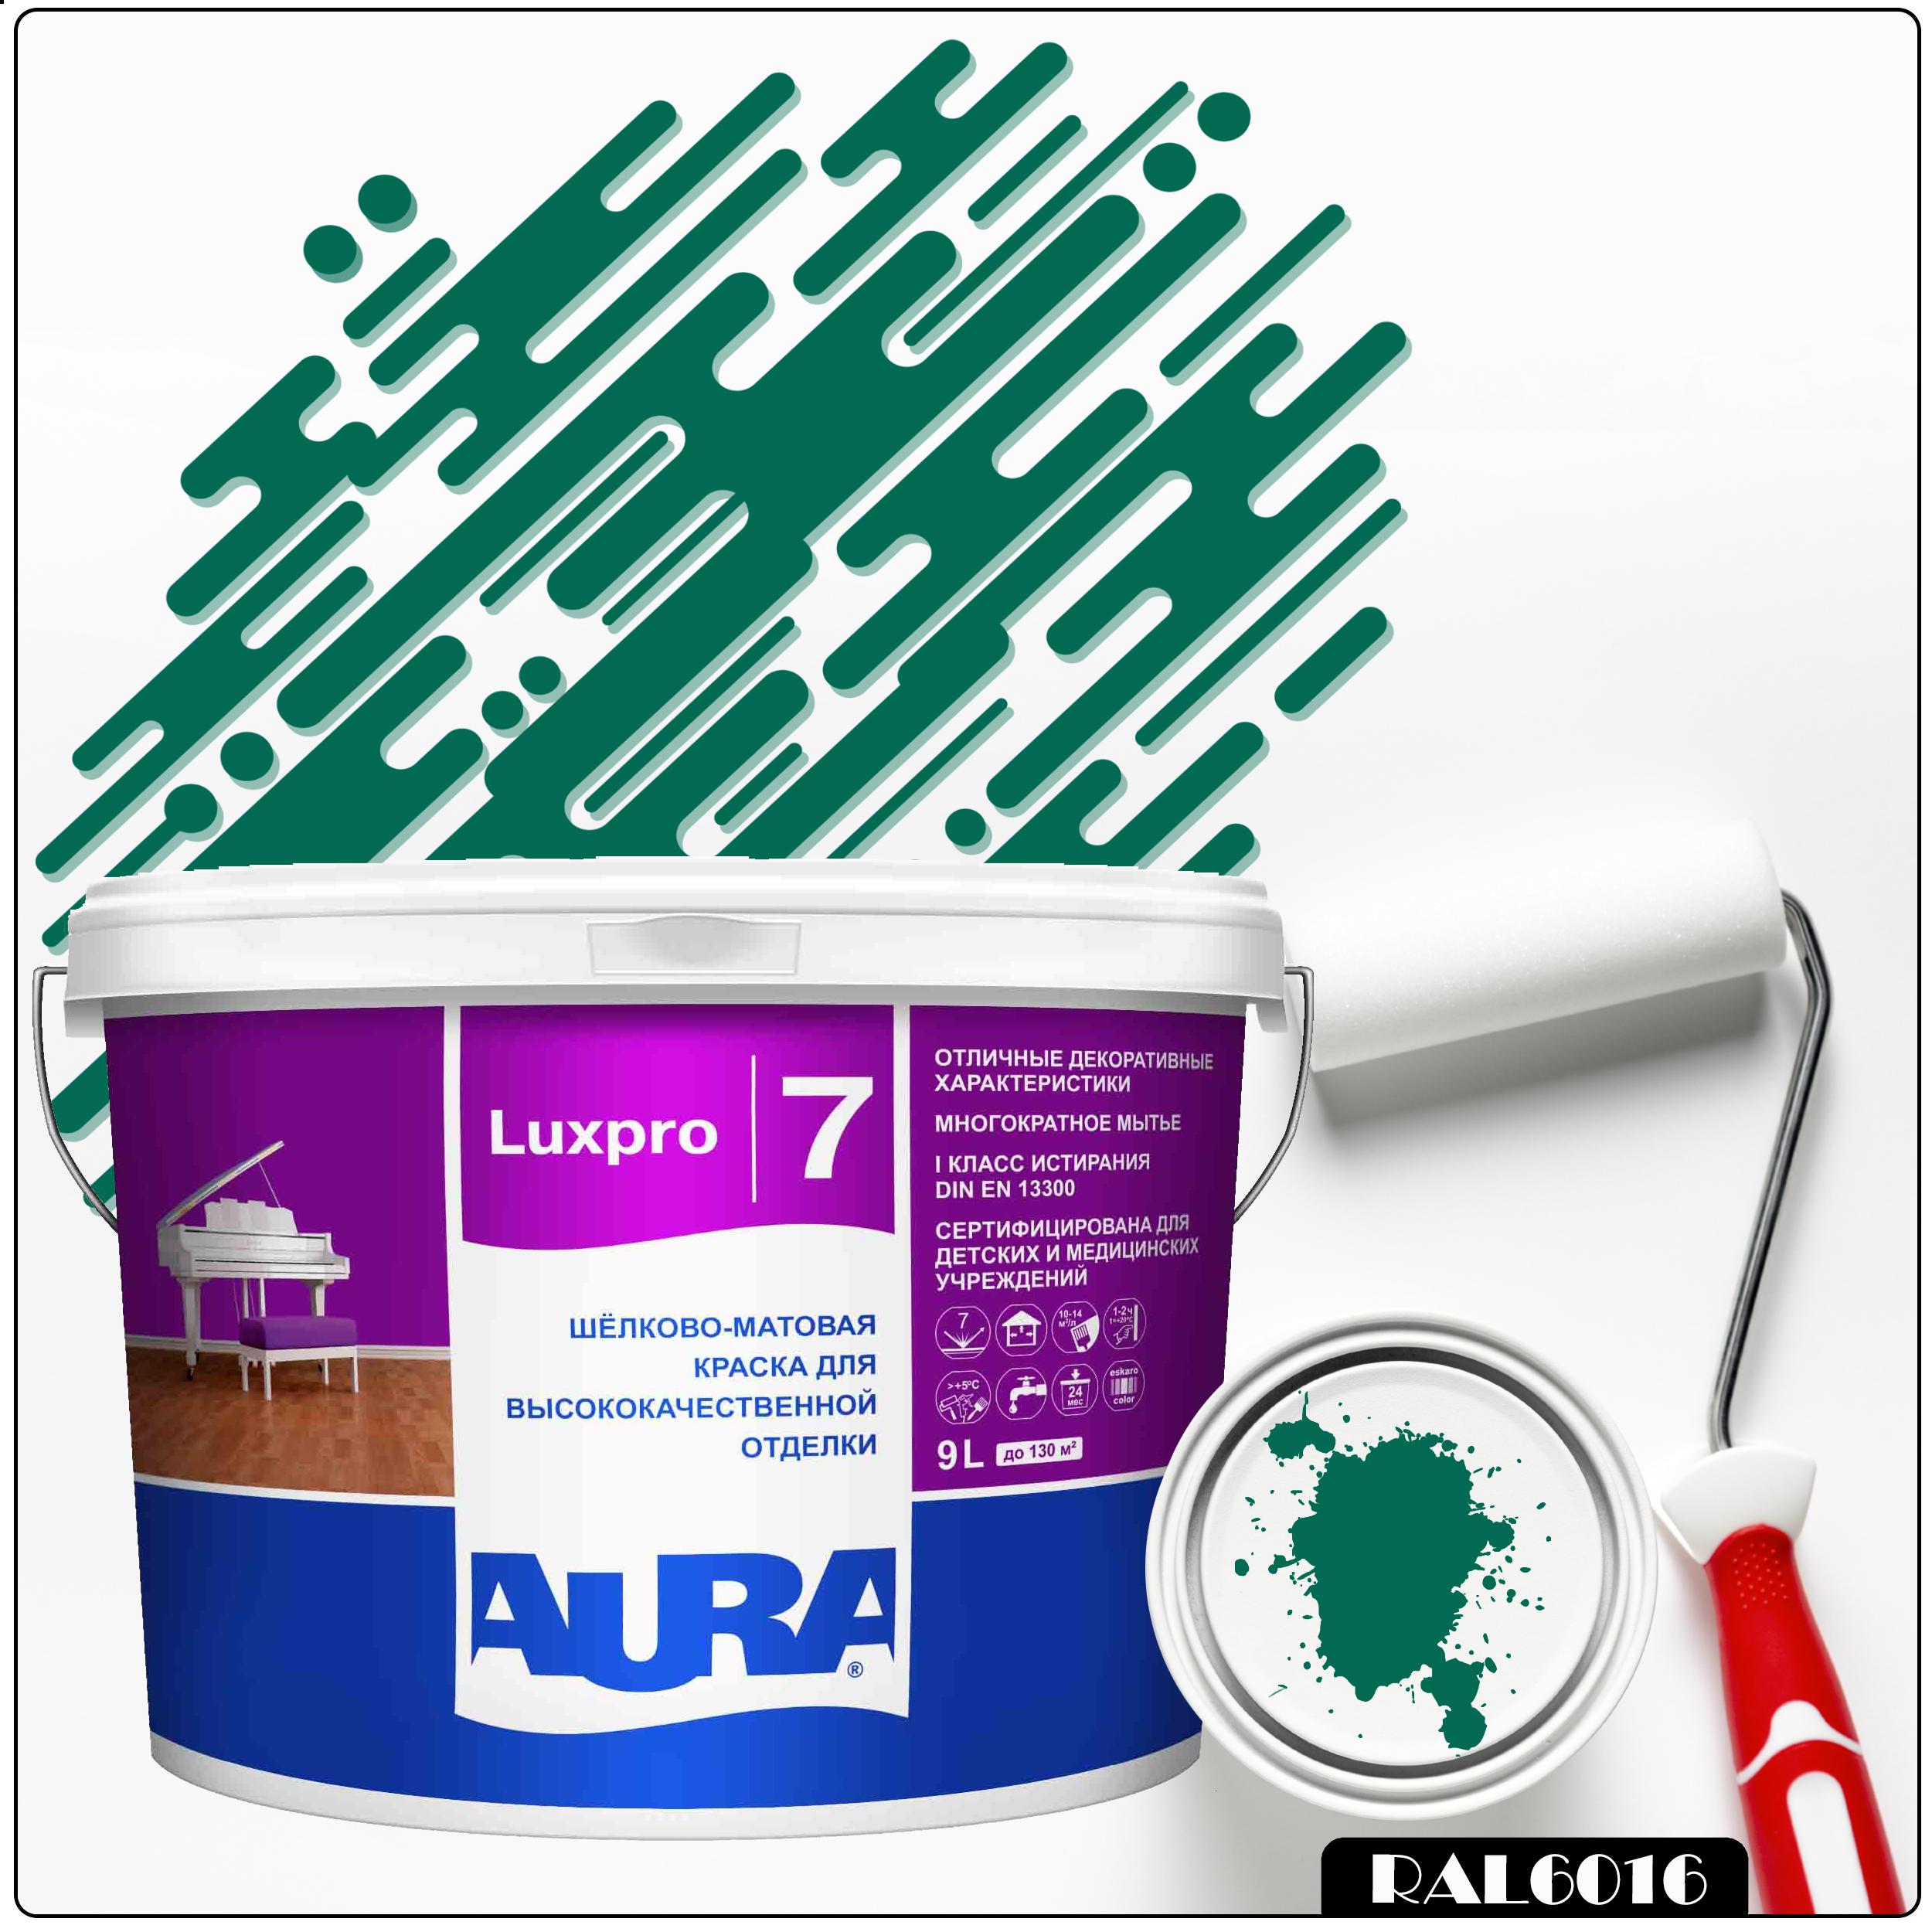 Фото 17 - Краска Aura LuxPRO 7, RAL 6016 Бирюзово-зелёный, латексная, шелково-матовая, интерьерная, 9л, Аура.